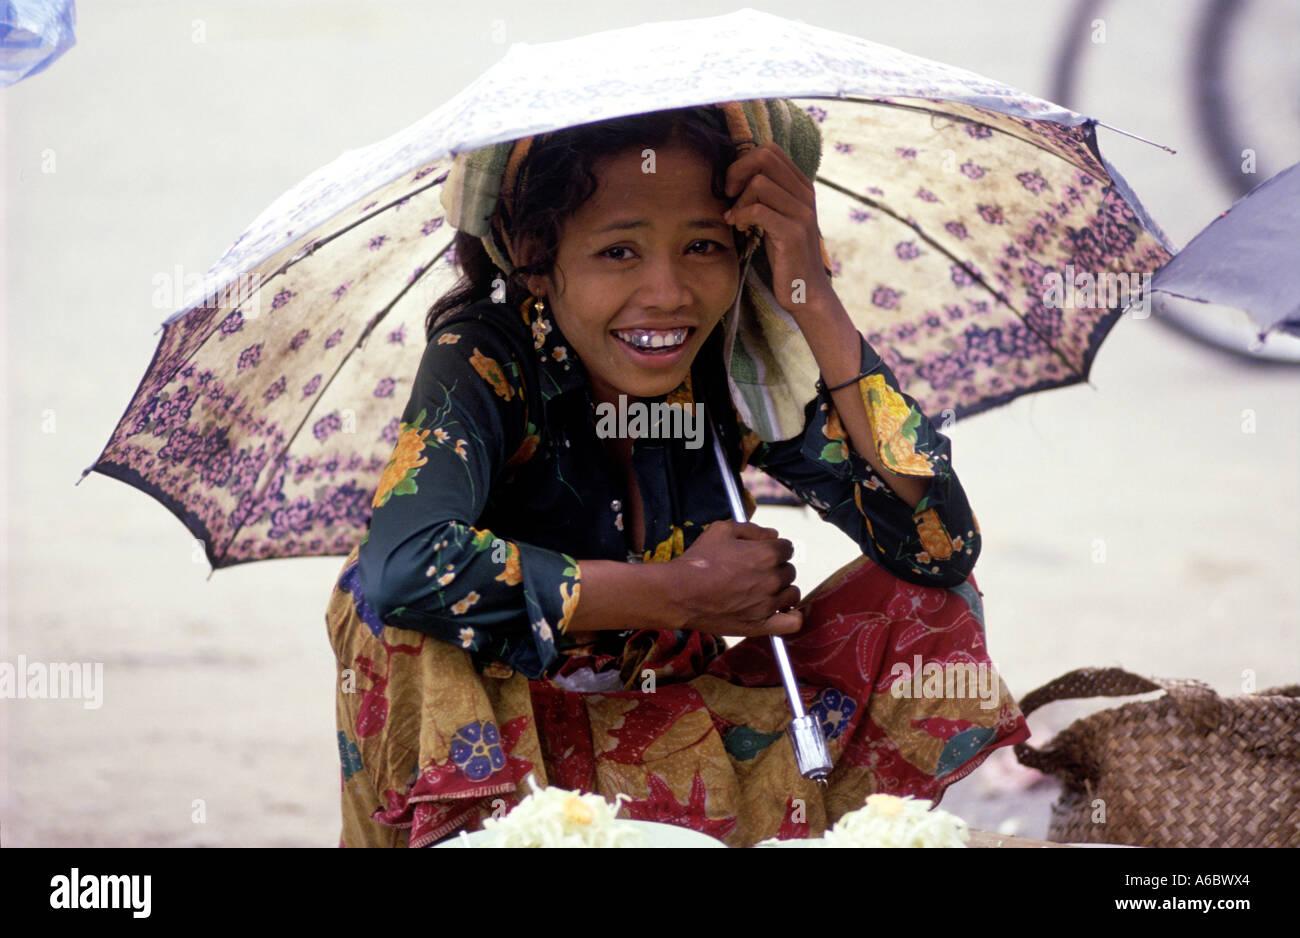 Girl in a Market, Banjarmasin, Kalimantan, Borneo, Indonesia. - Stock Image